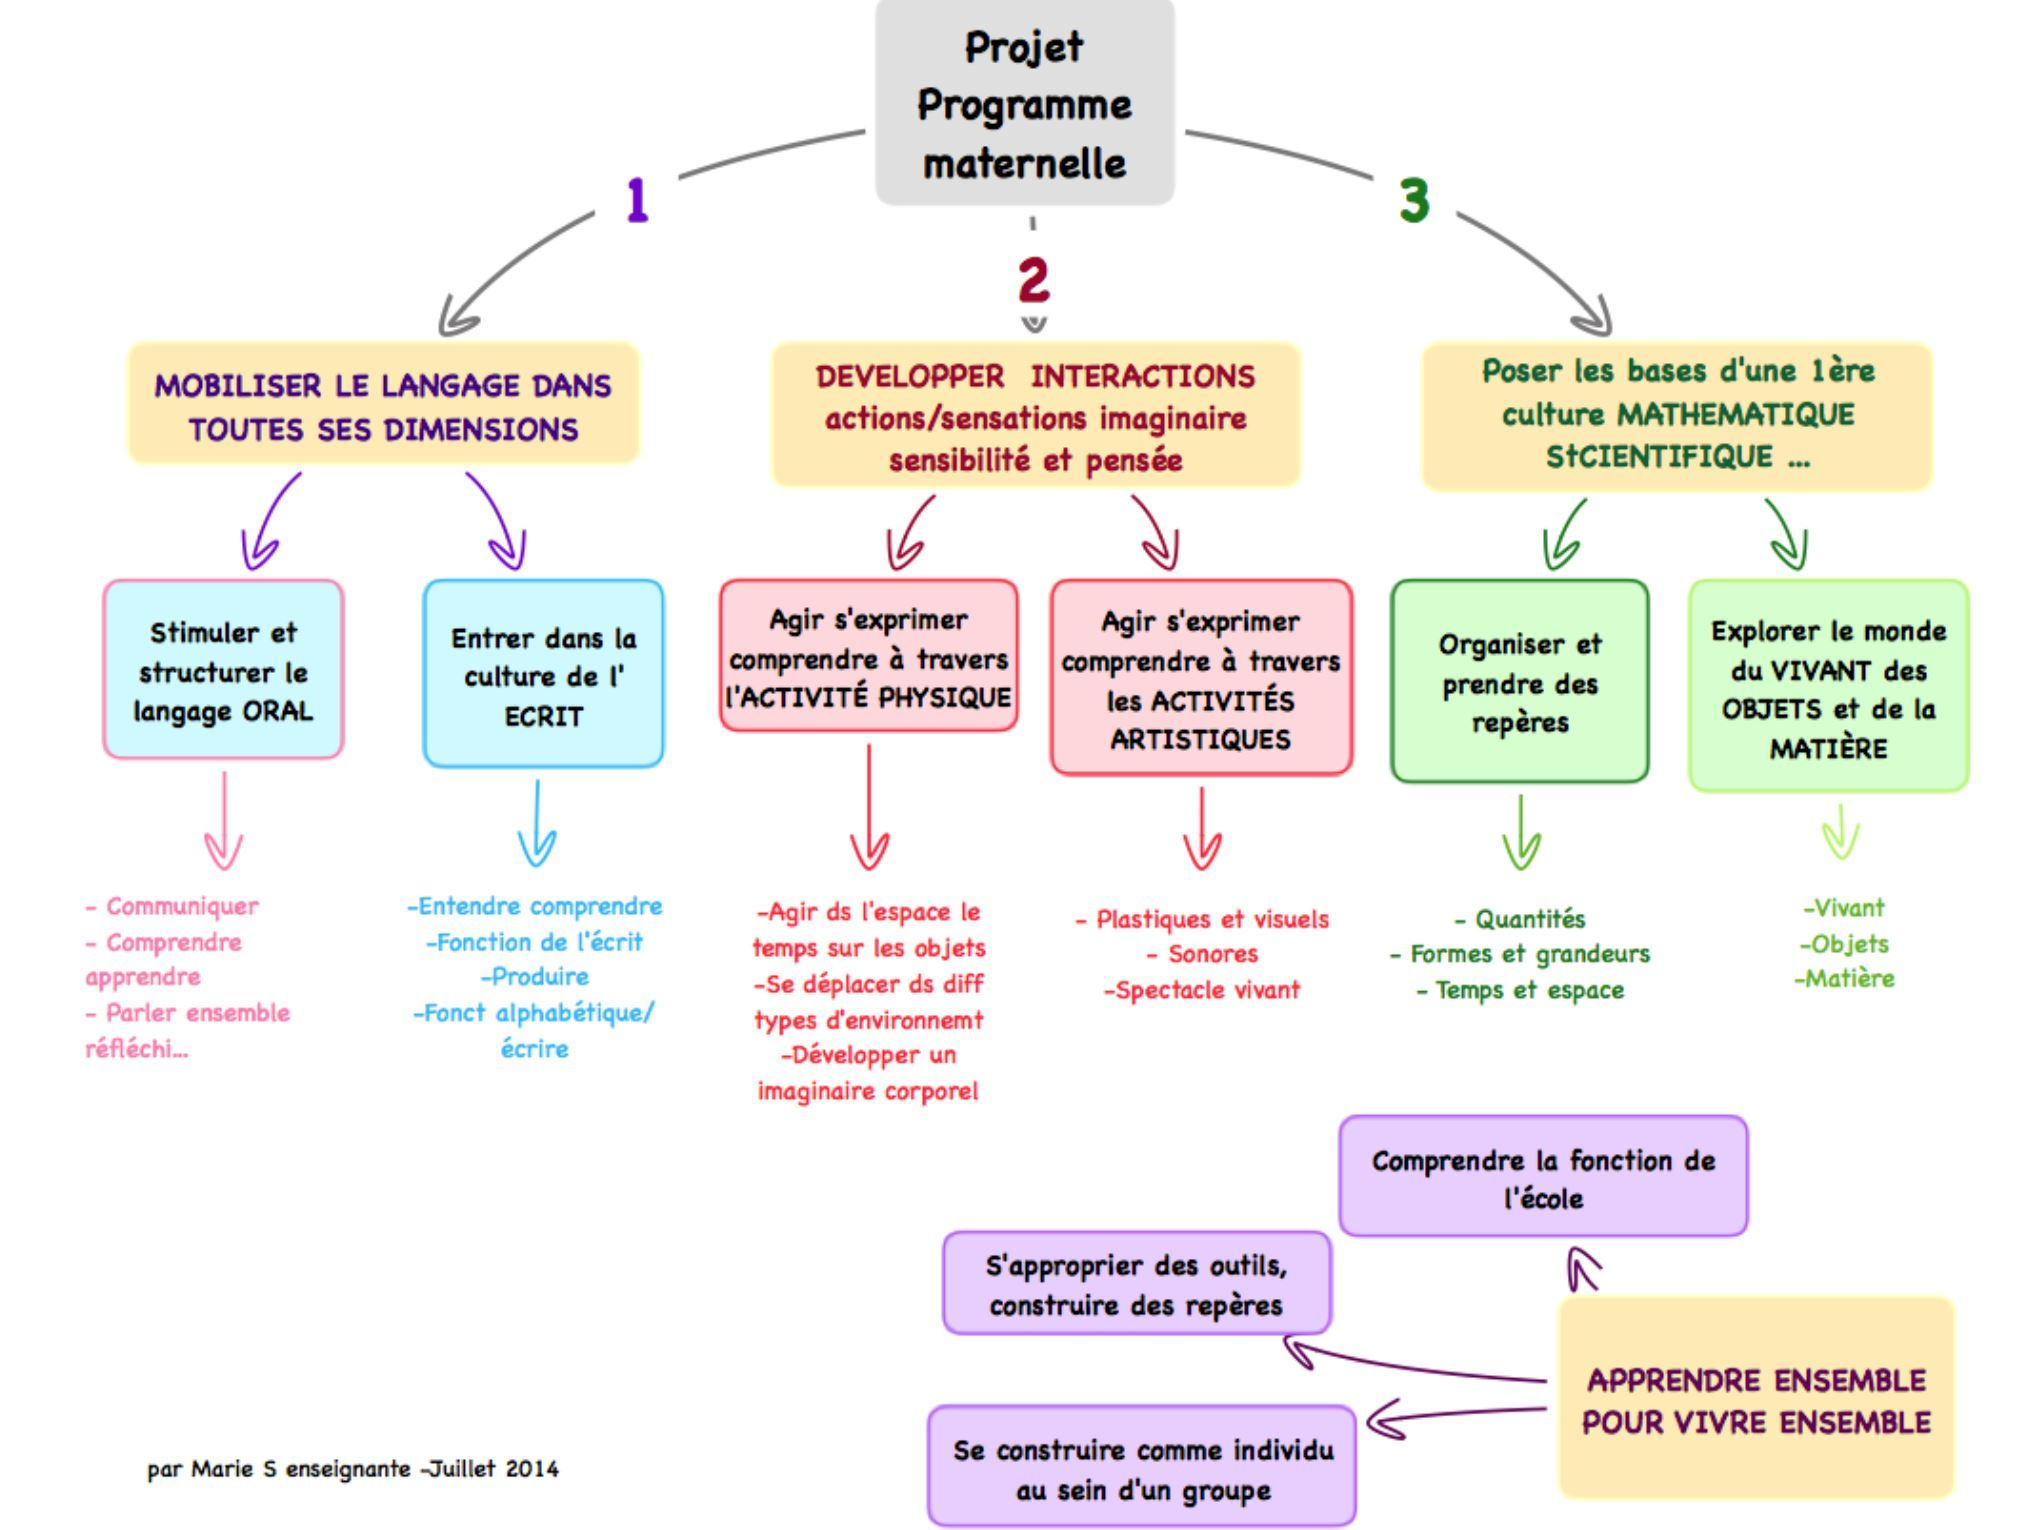 Programmation Rentrée Grande Section Maternelle concernant Rentr?E Grande Section Maternelle